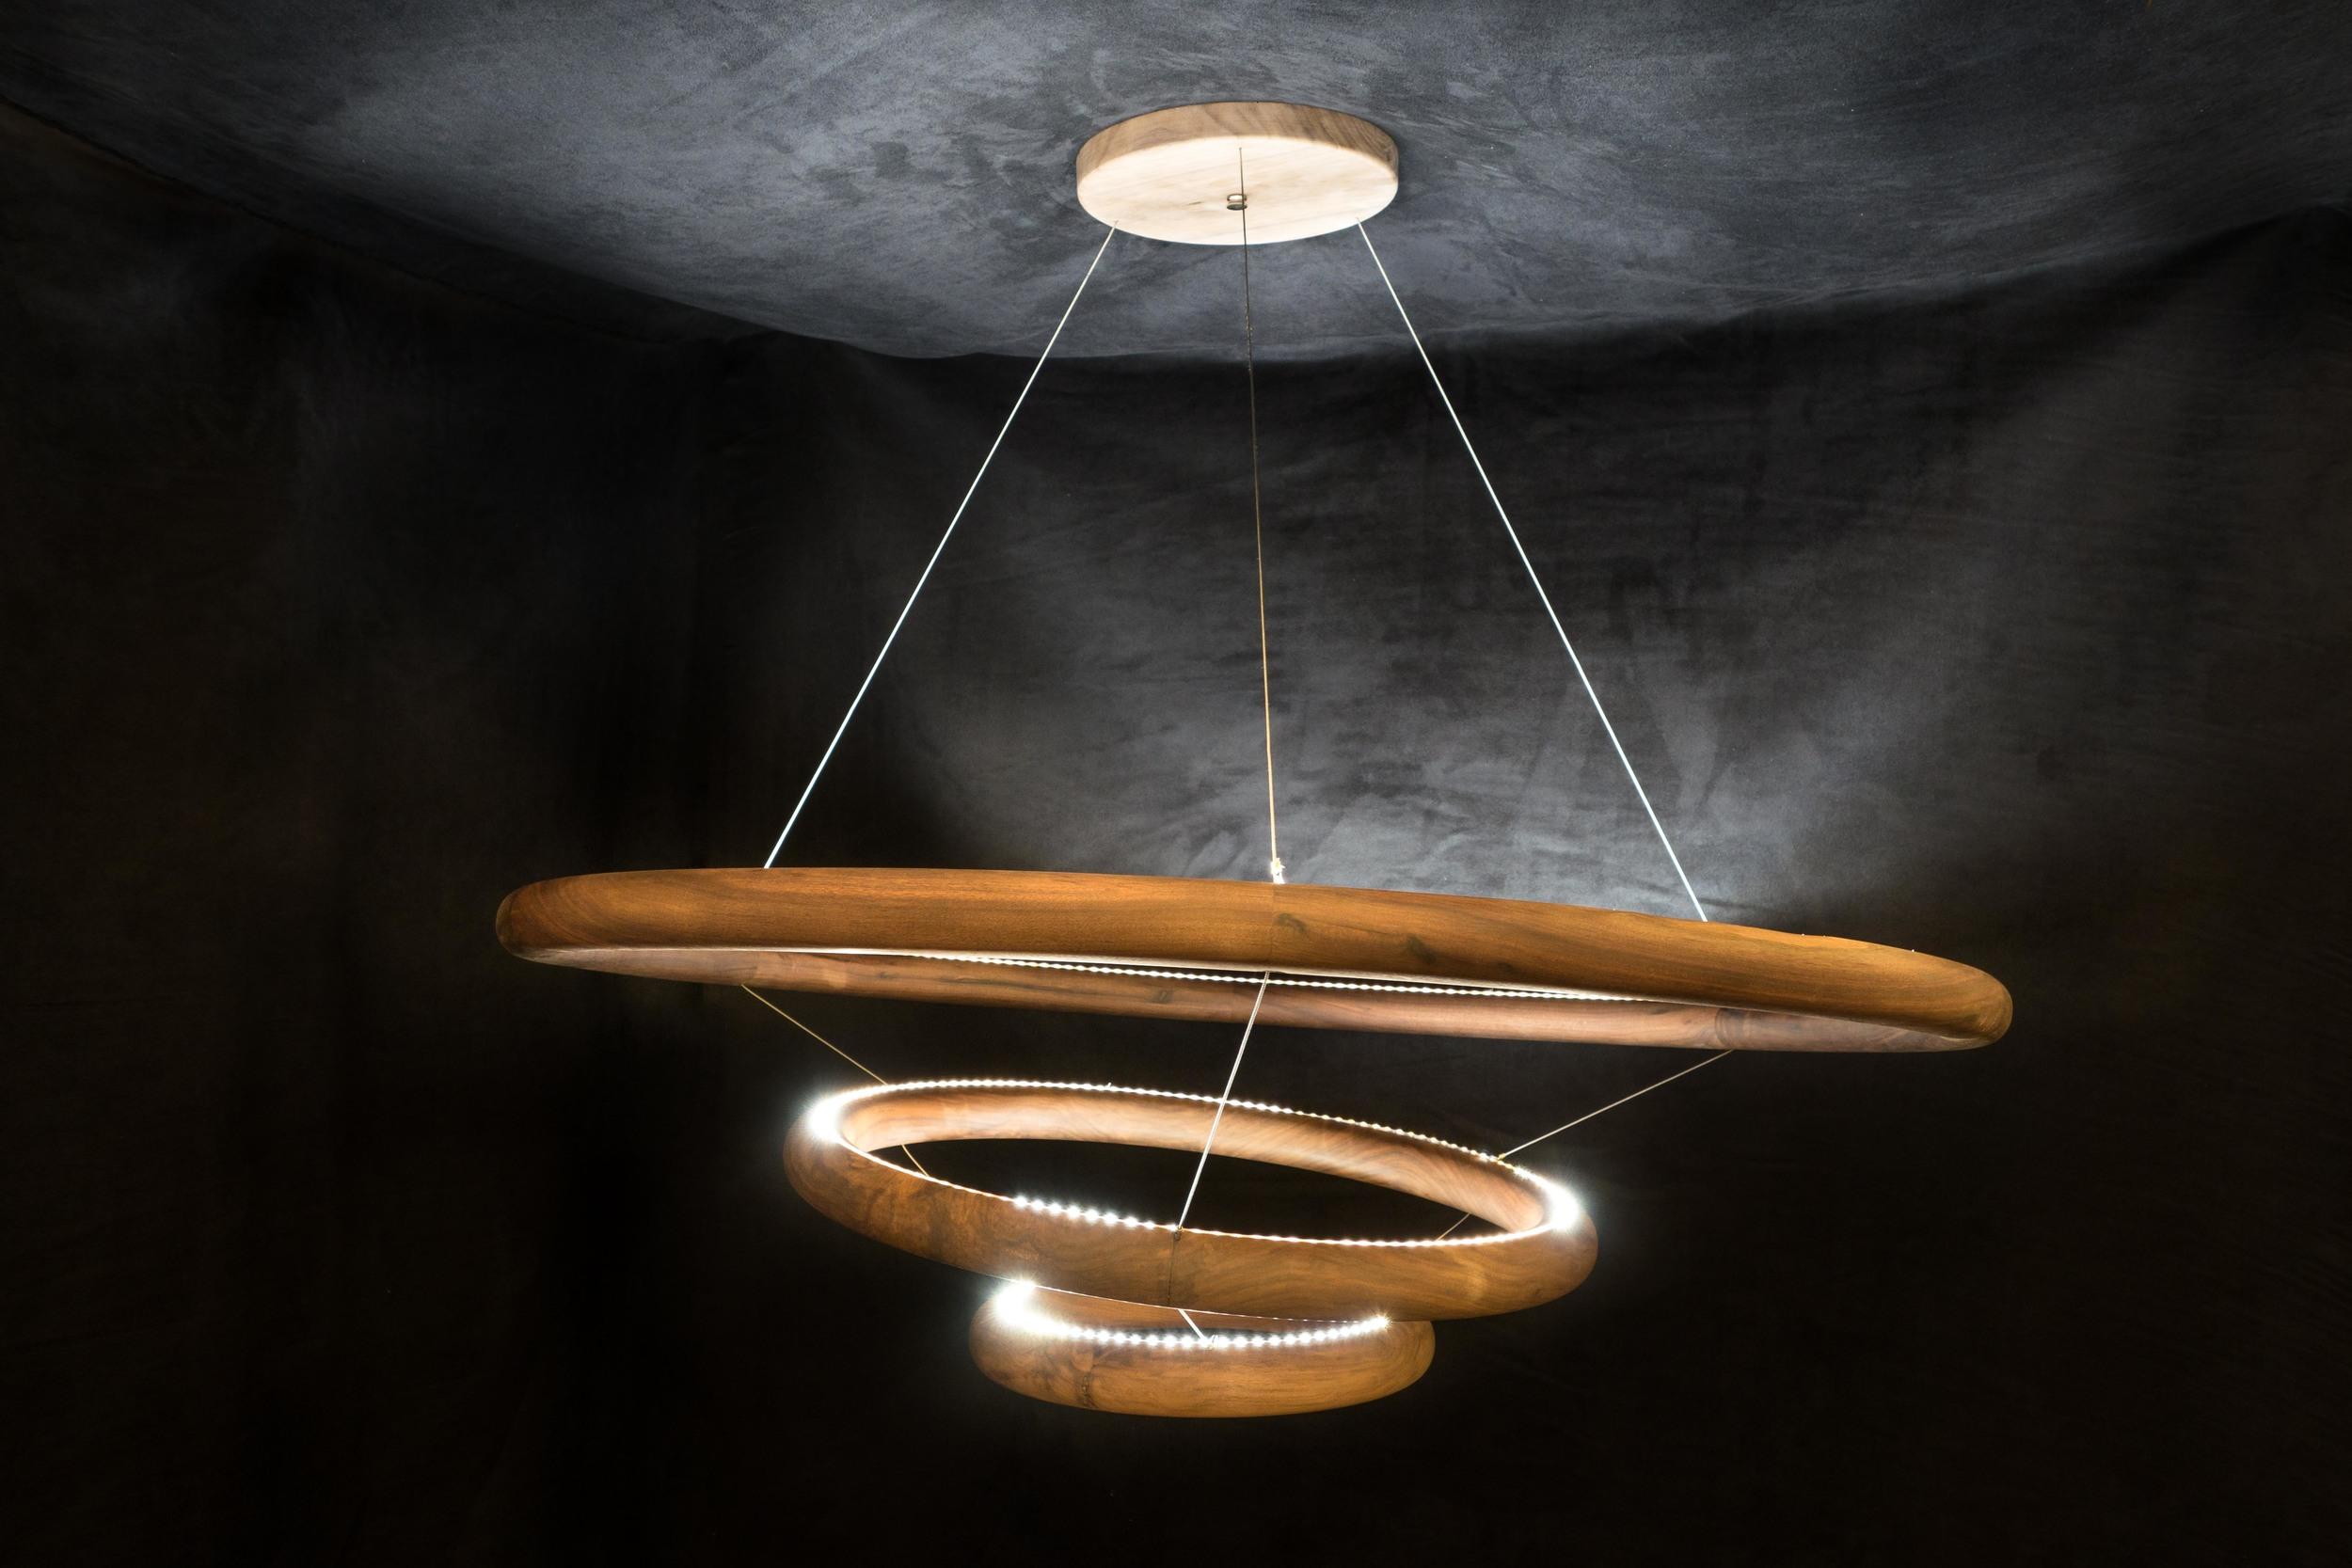 reviews hinkley sputnik light wayfair led pdx melanie lighting chandelier urchin